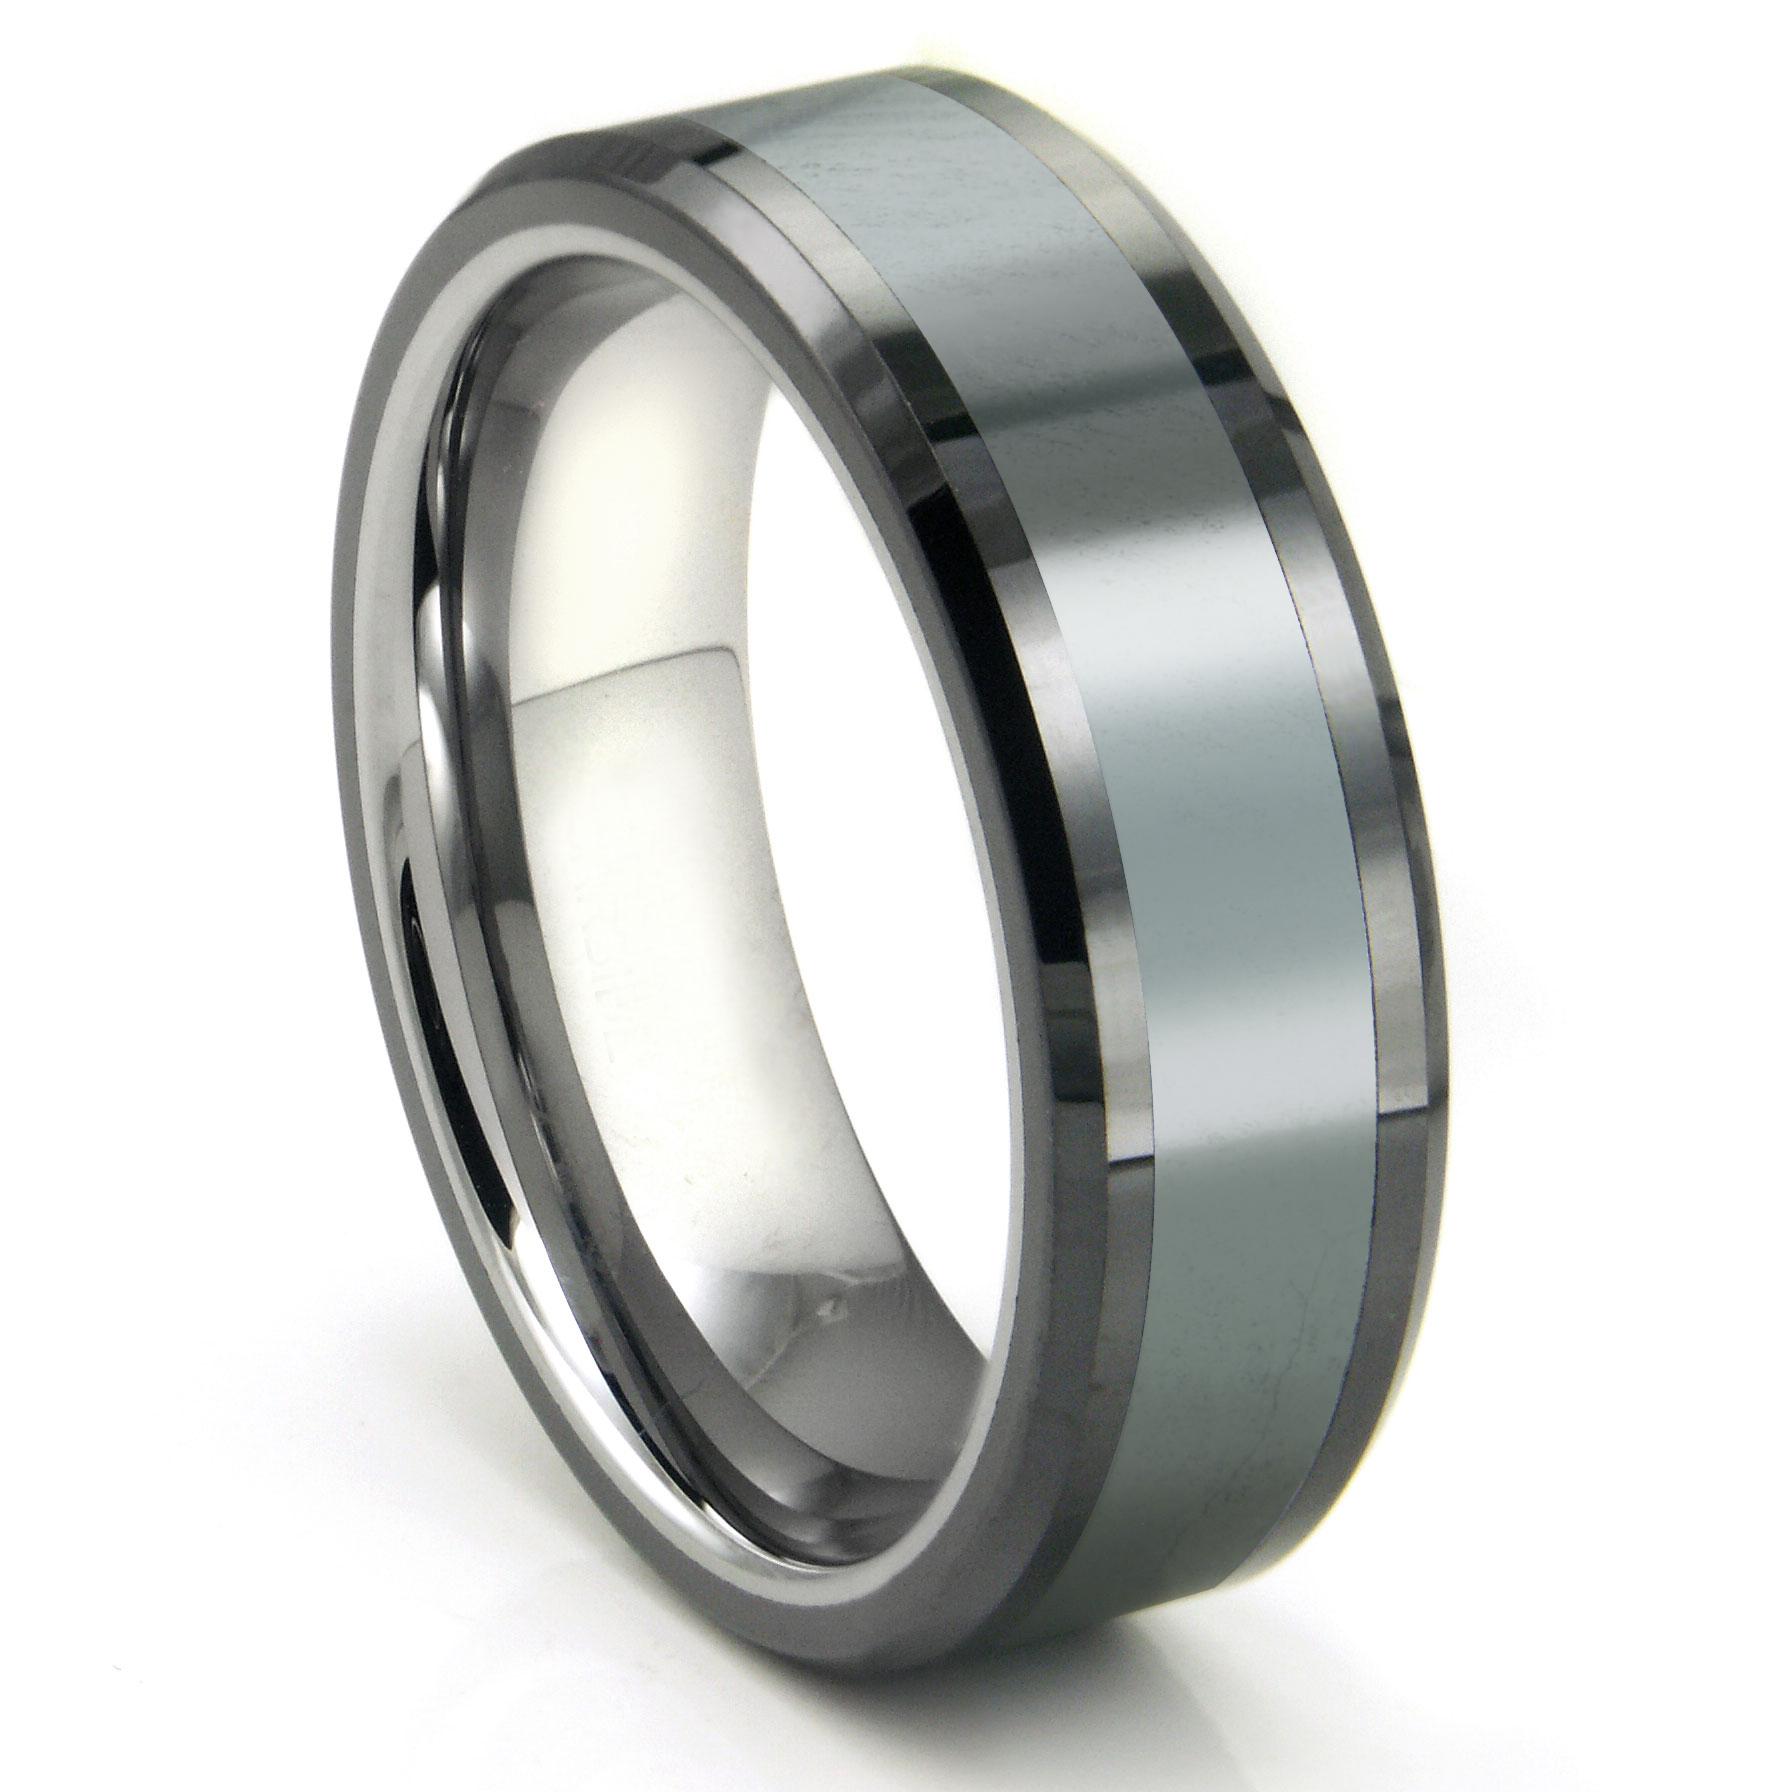 Mens Tungsten Carbide Rings mens titanium wedding rings Tungsten Carbide Grey Meteorite Inlay Wedding Band Ring